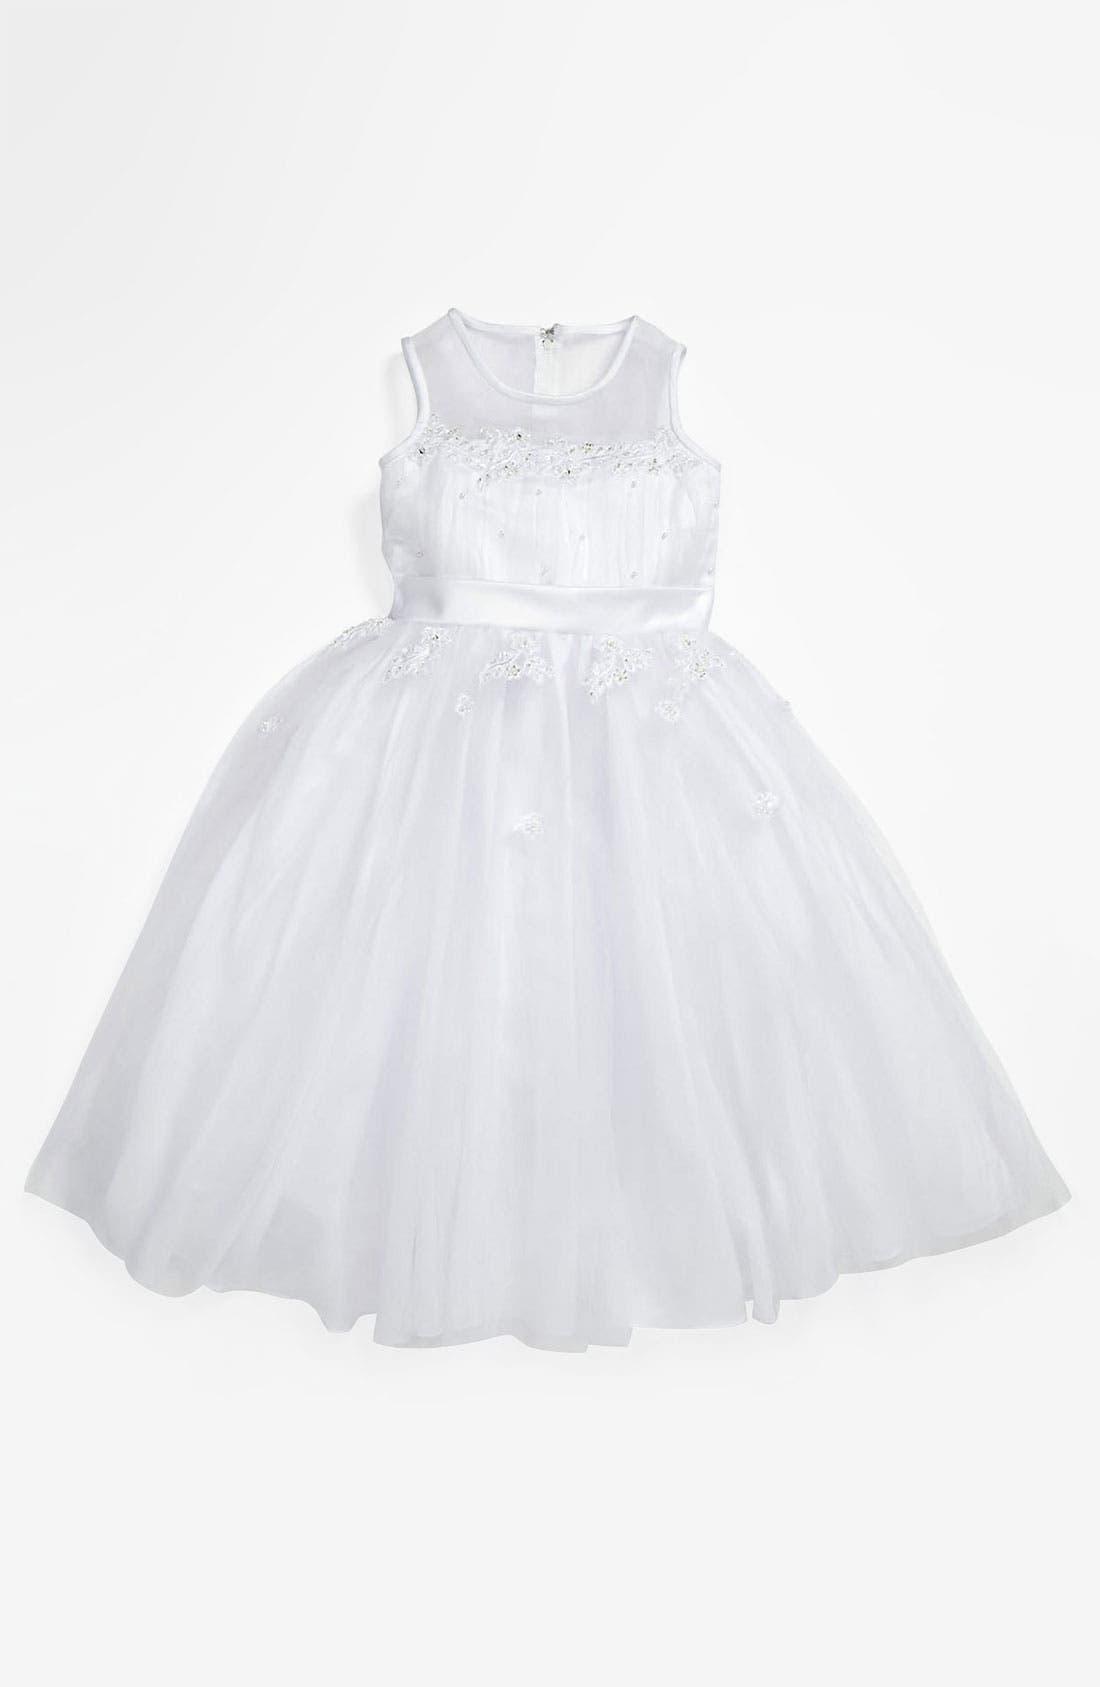 Alternate Image 1 Selected - Lauren Marie Illusion Top Gown (Little Girls & Big Girls)